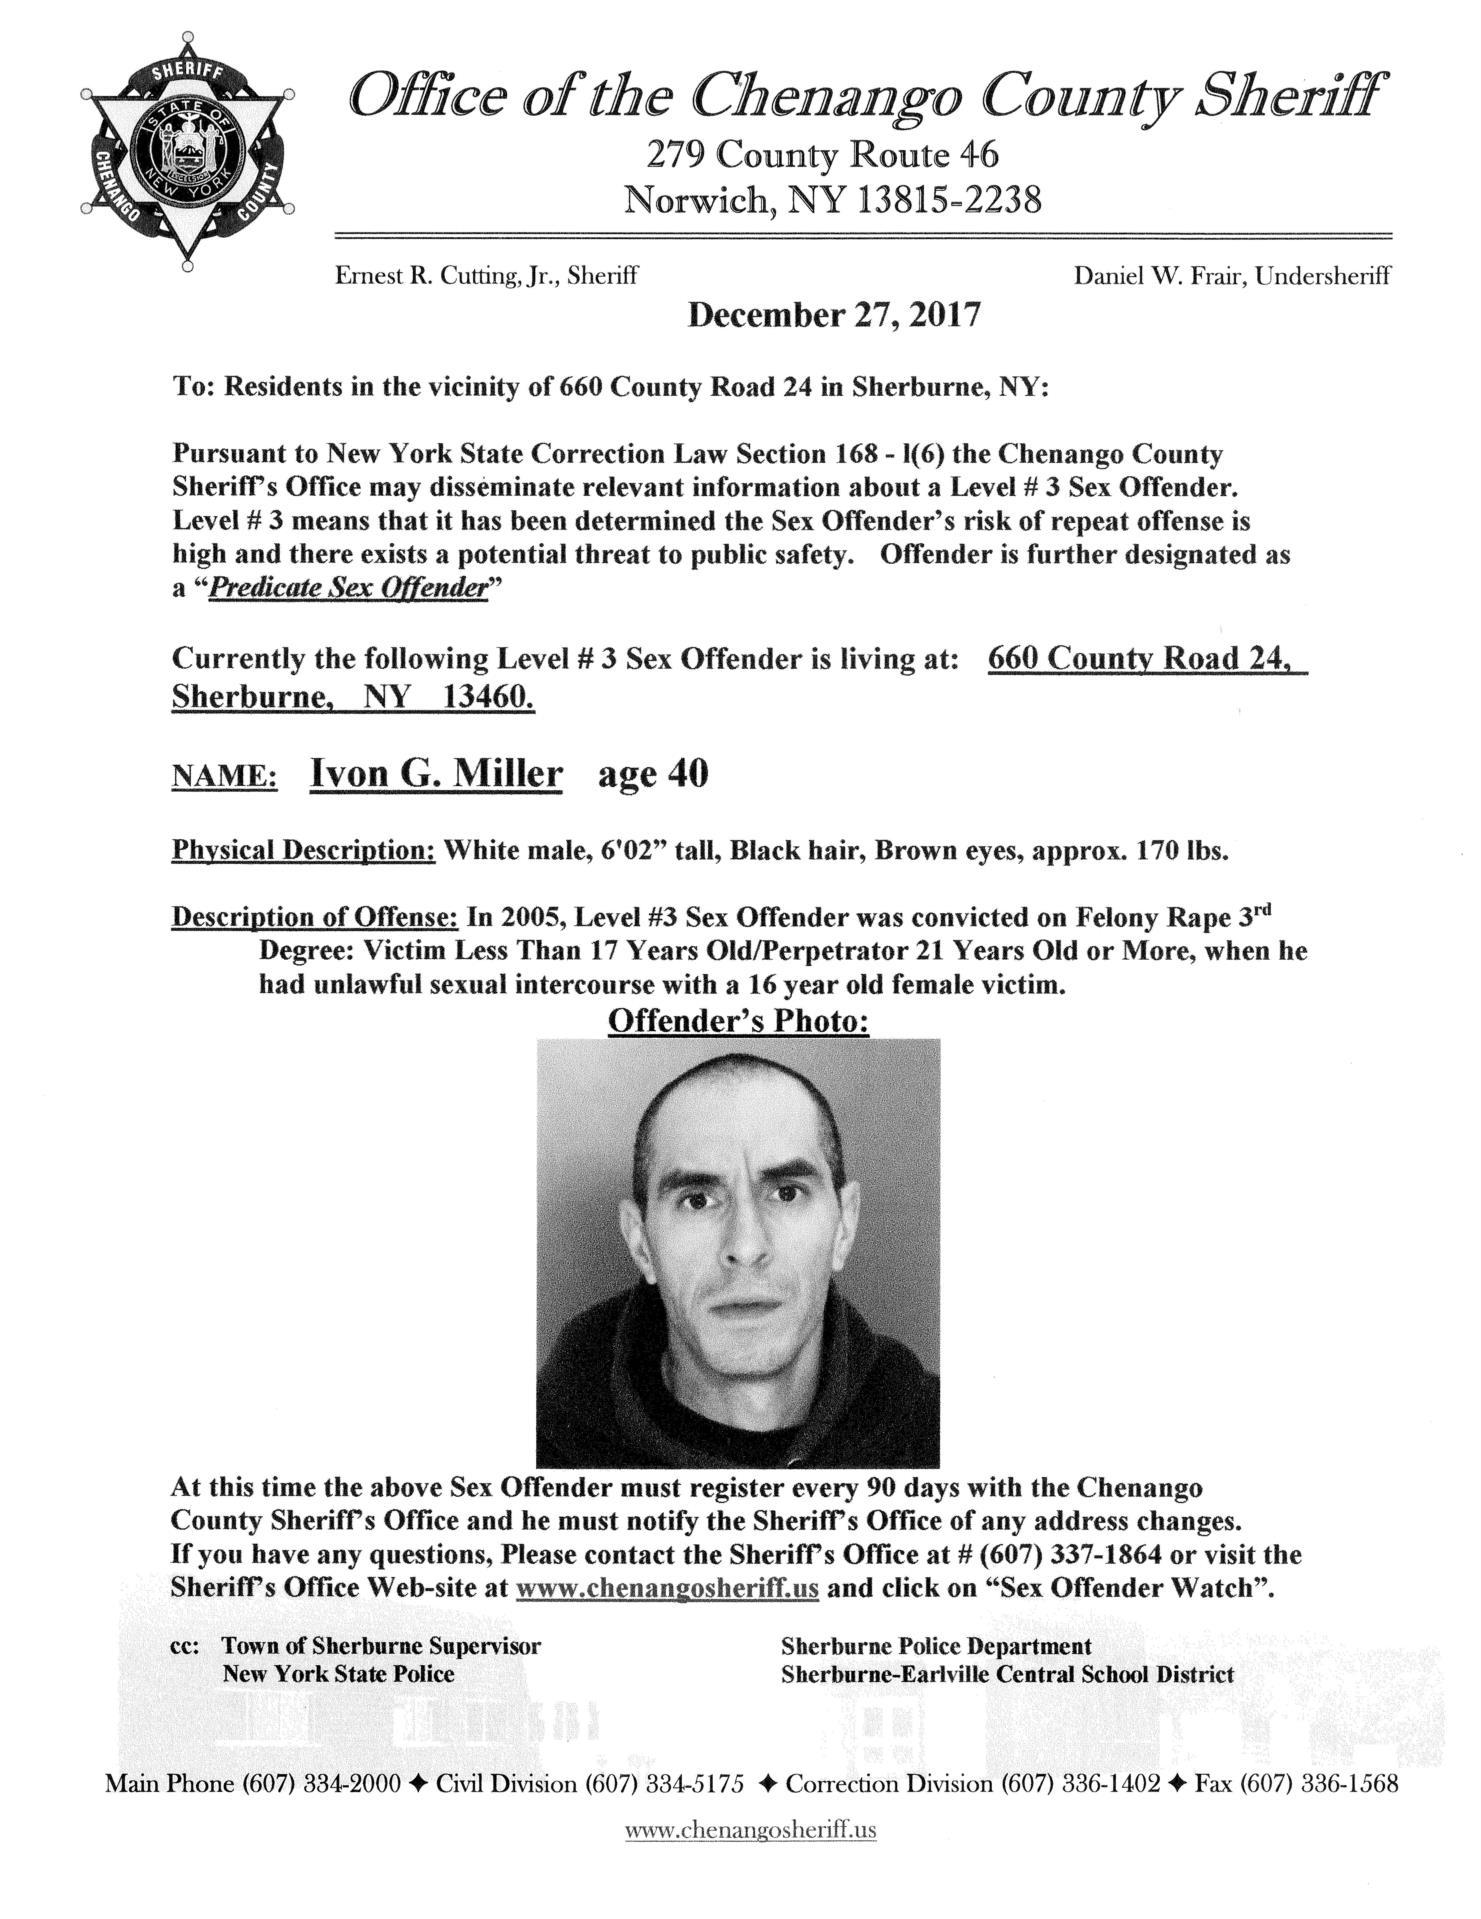 Sex Offender Miller